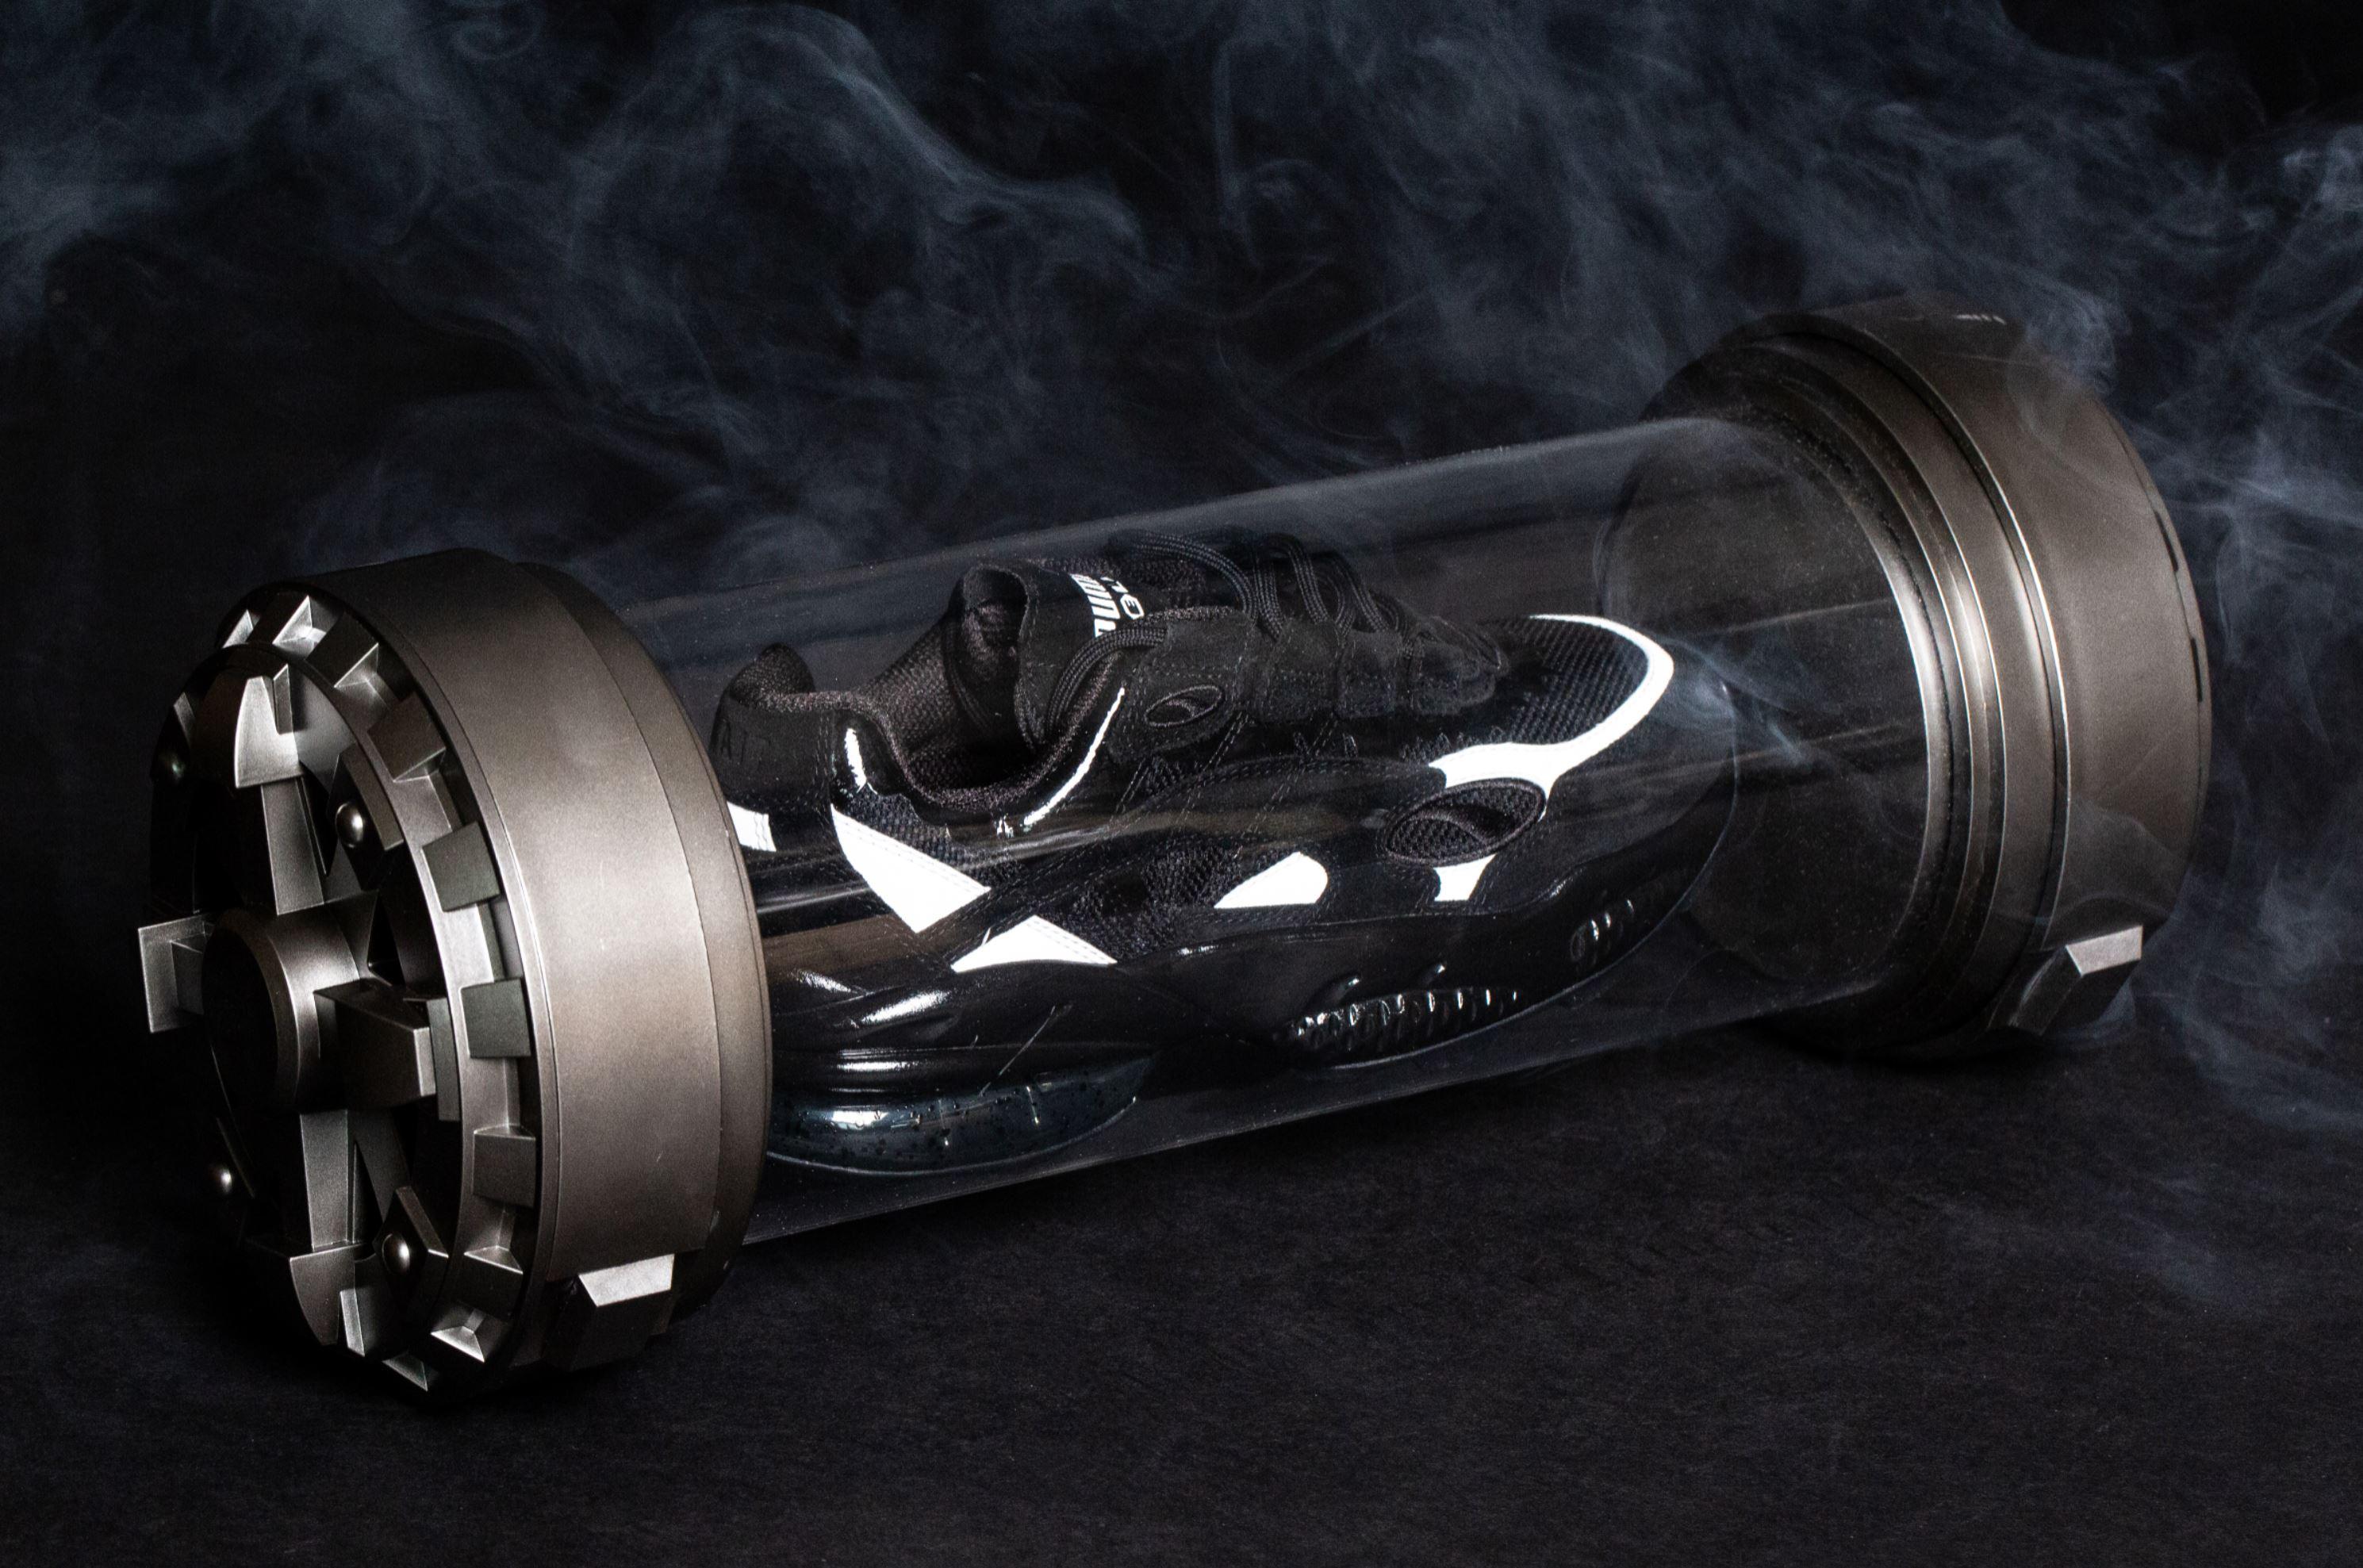 venom sneaker BAIT x Puma Cell